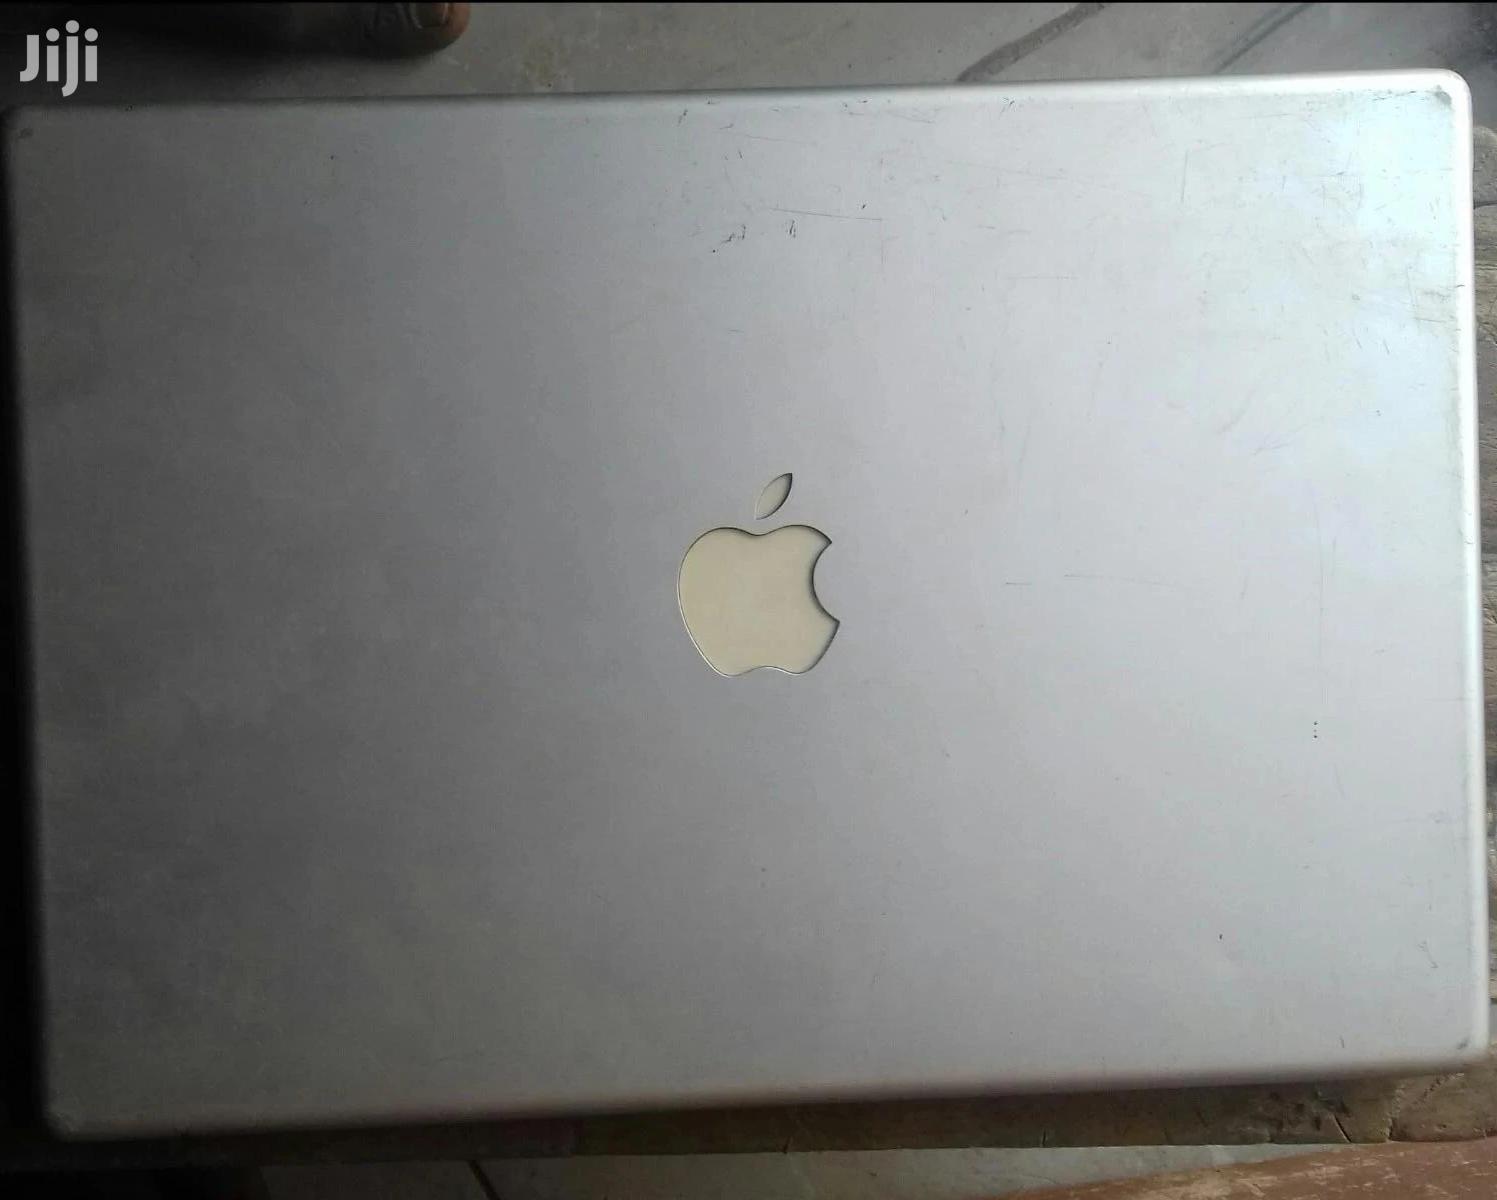 Laptop Apple MacBook 4GB Intel HDD 60GB | Laptops & Computers for sale in Bosomtwe, Ashanti, Ghana